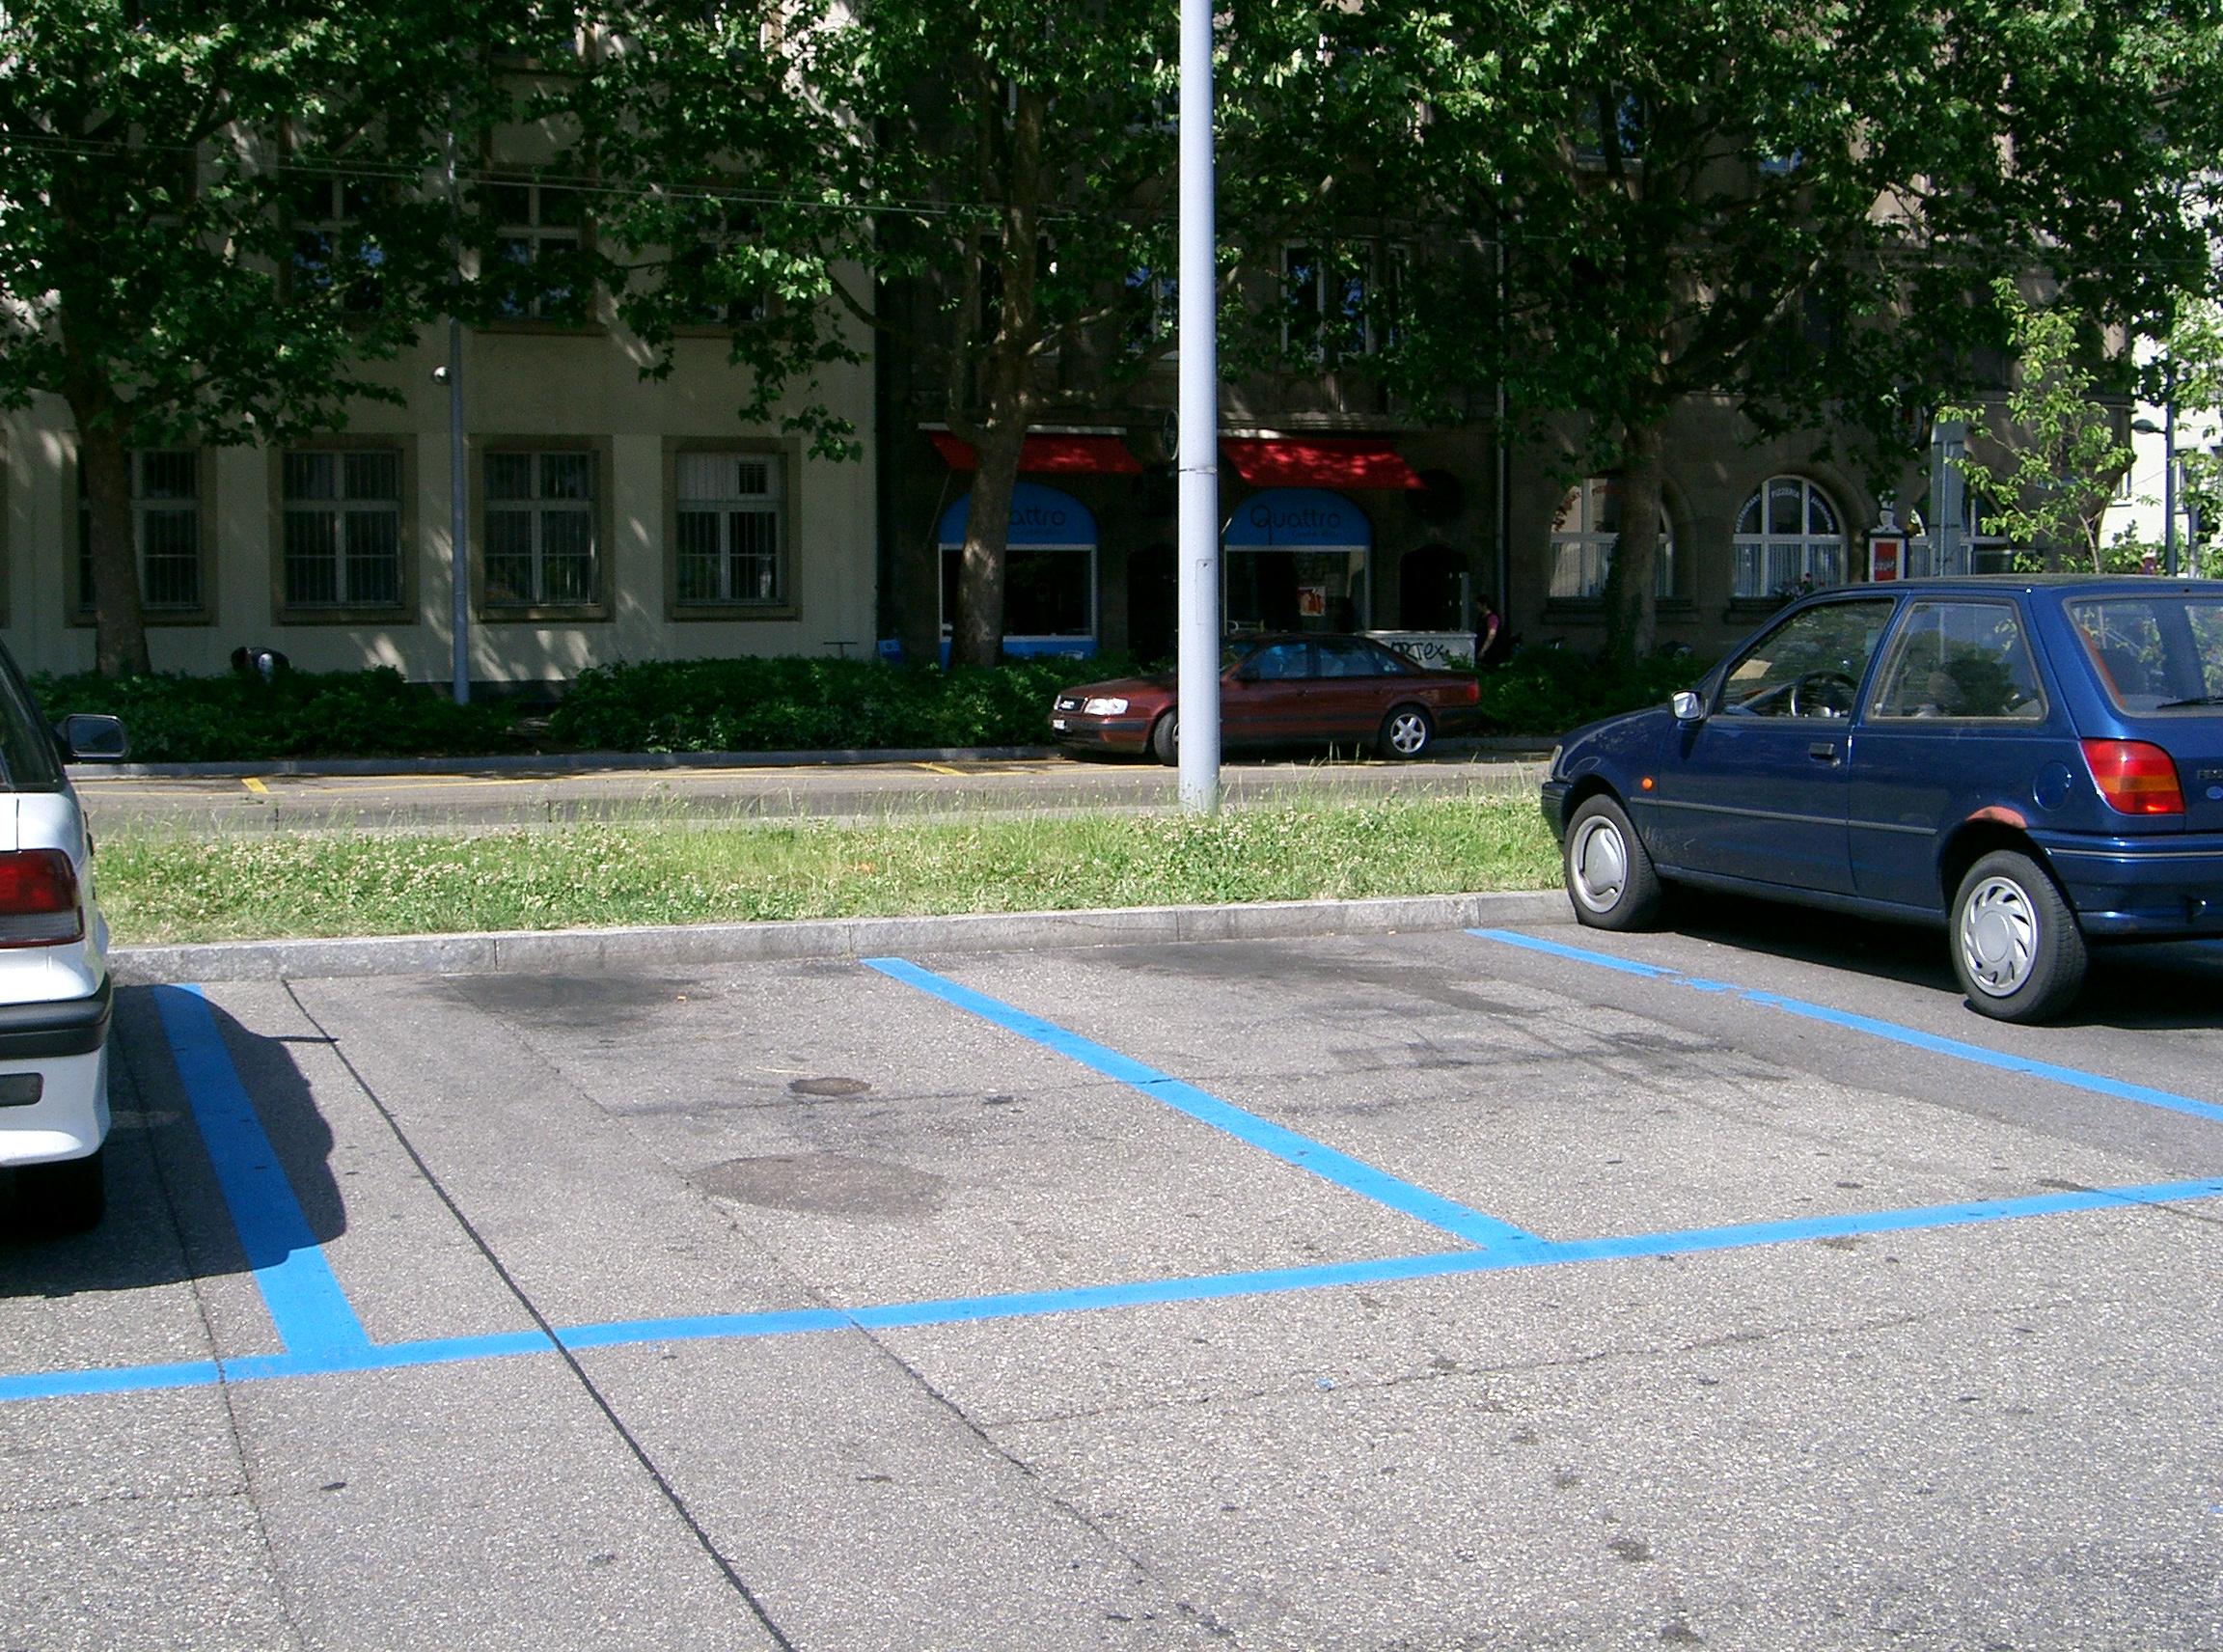 Parking Spaces Per Car